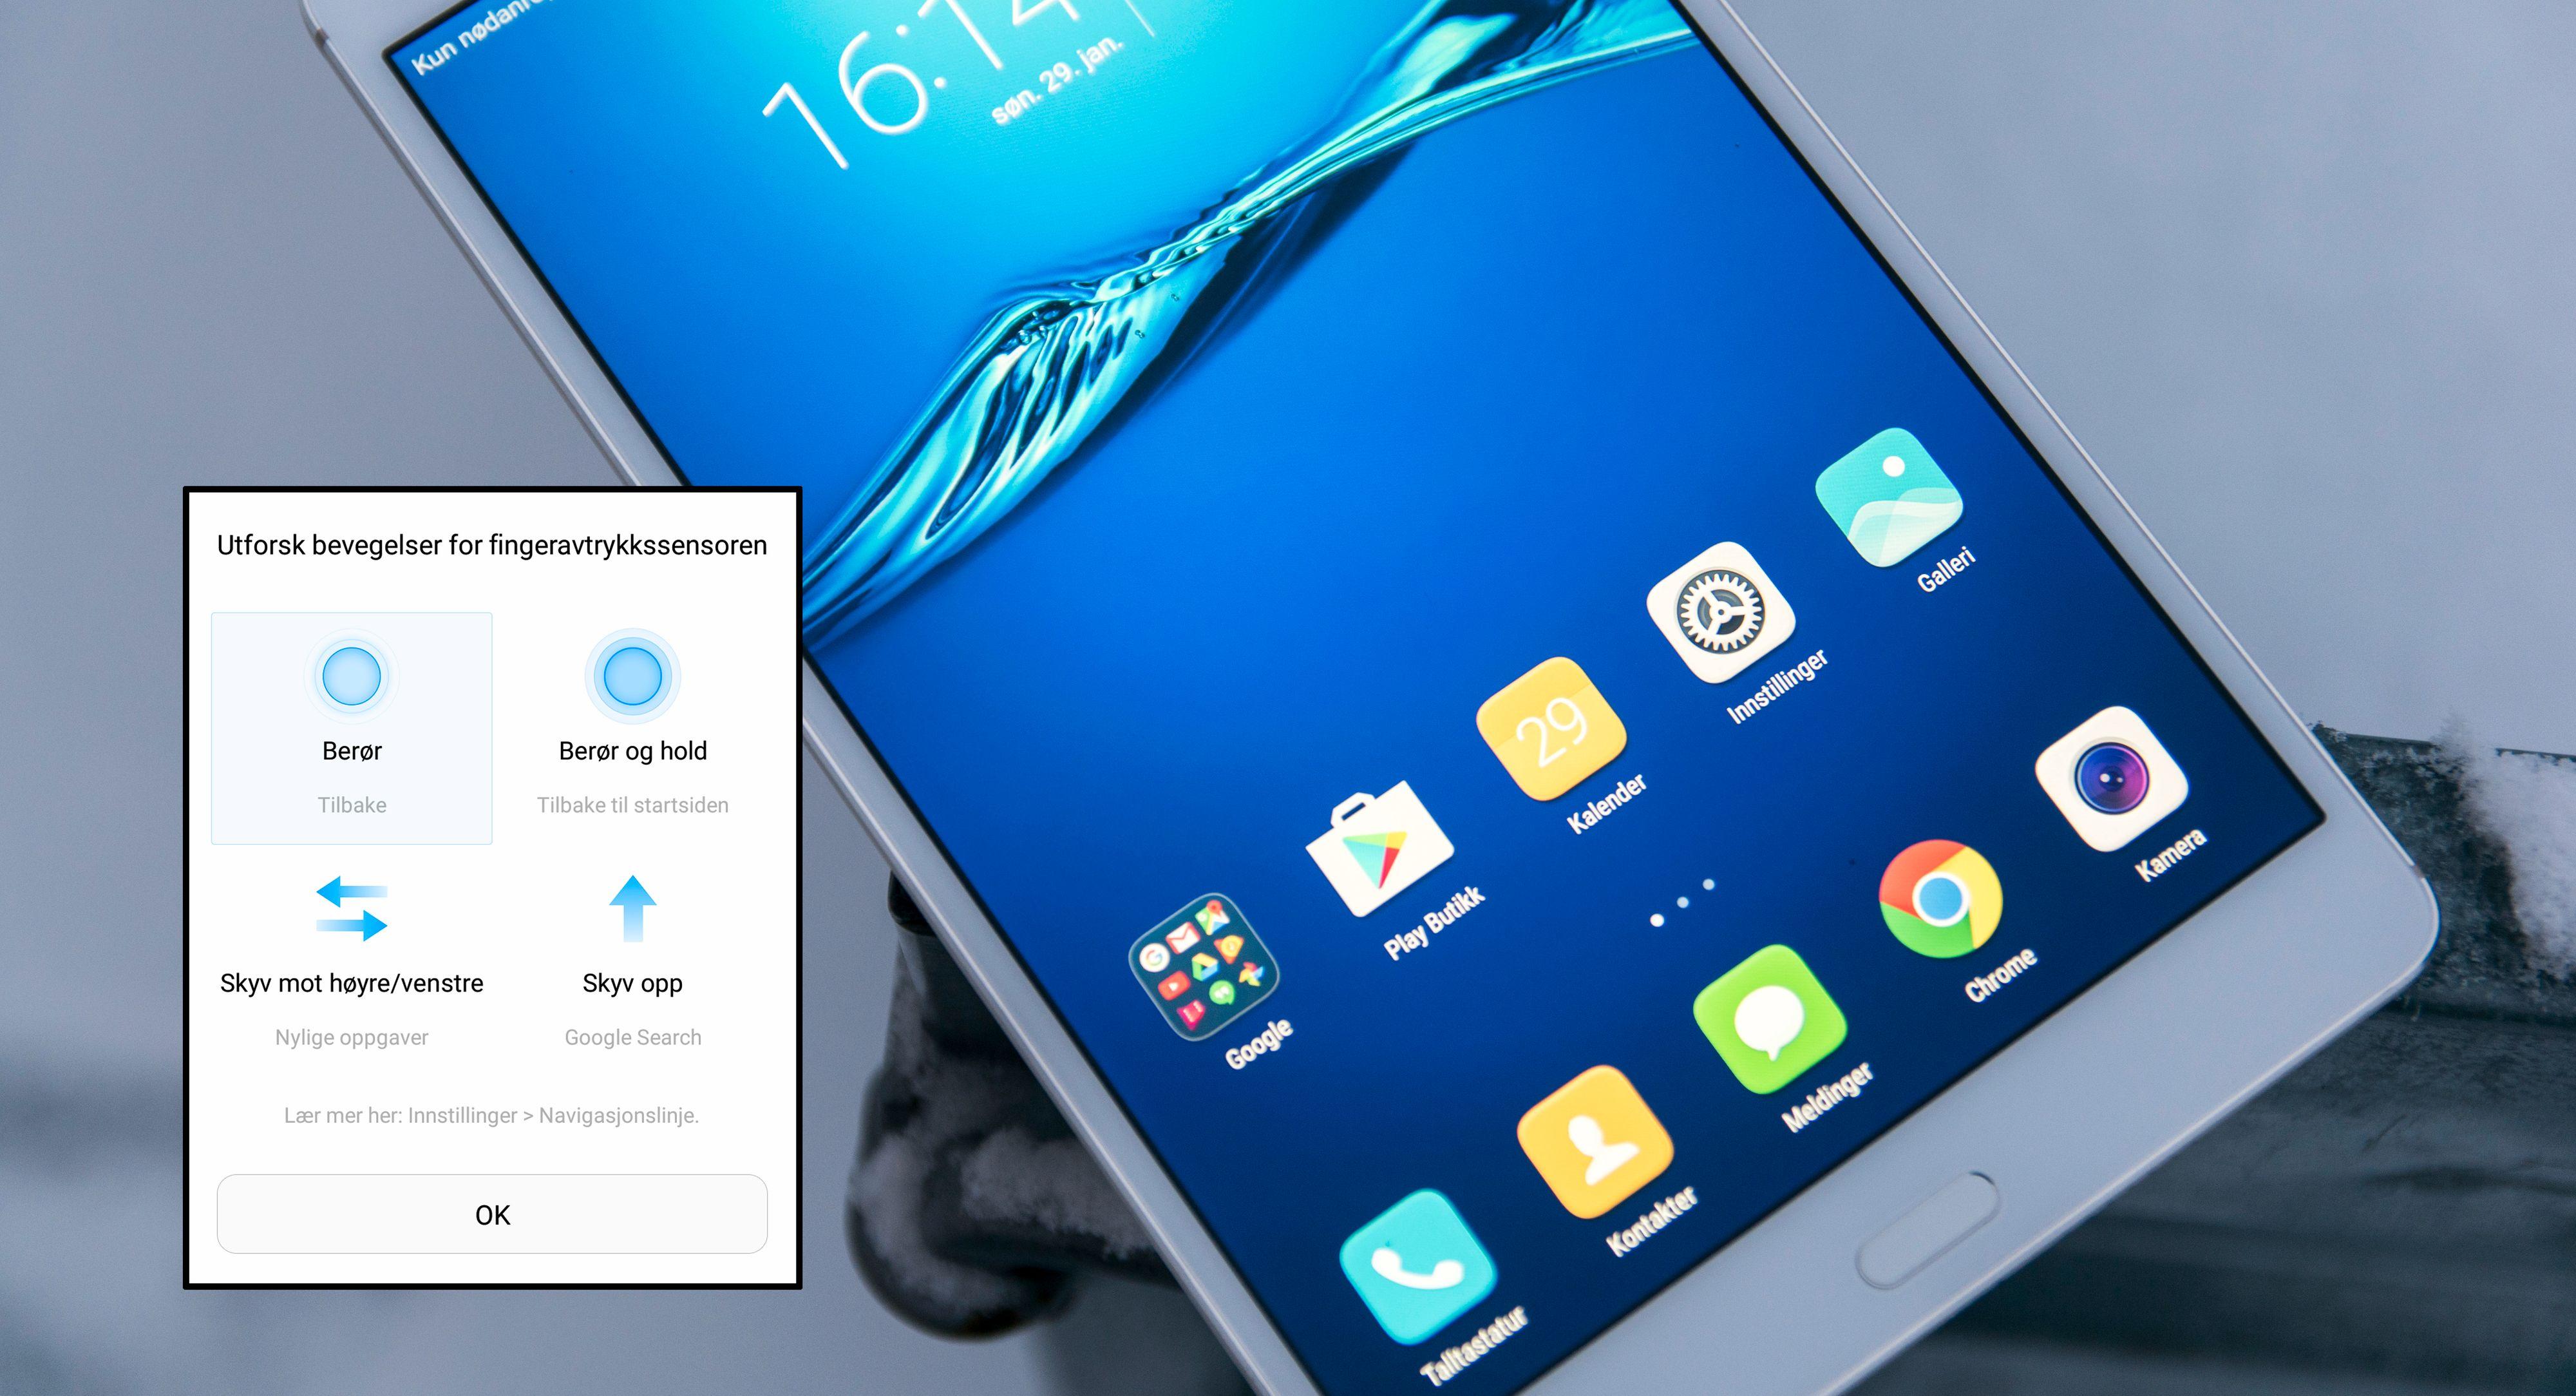 Huawei MediaPad M3 Lite vs iPad 9,7 Test Tek.no